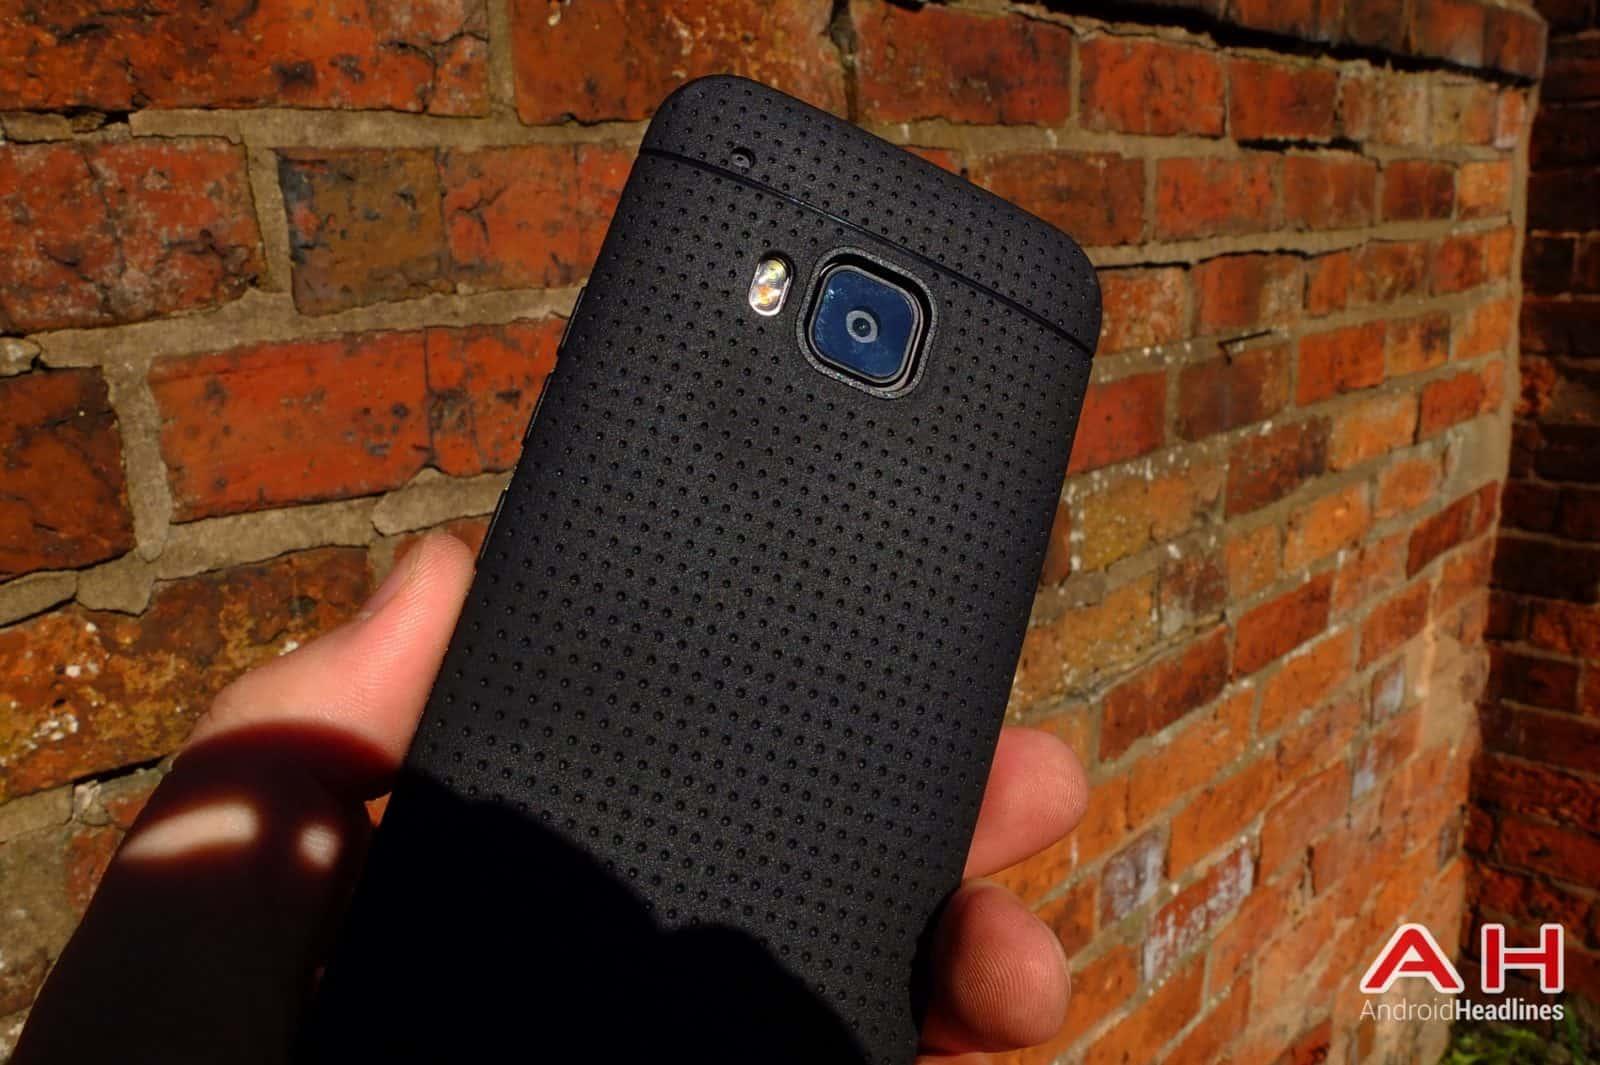 HTC One M9 FlexiShield Dot AH 03